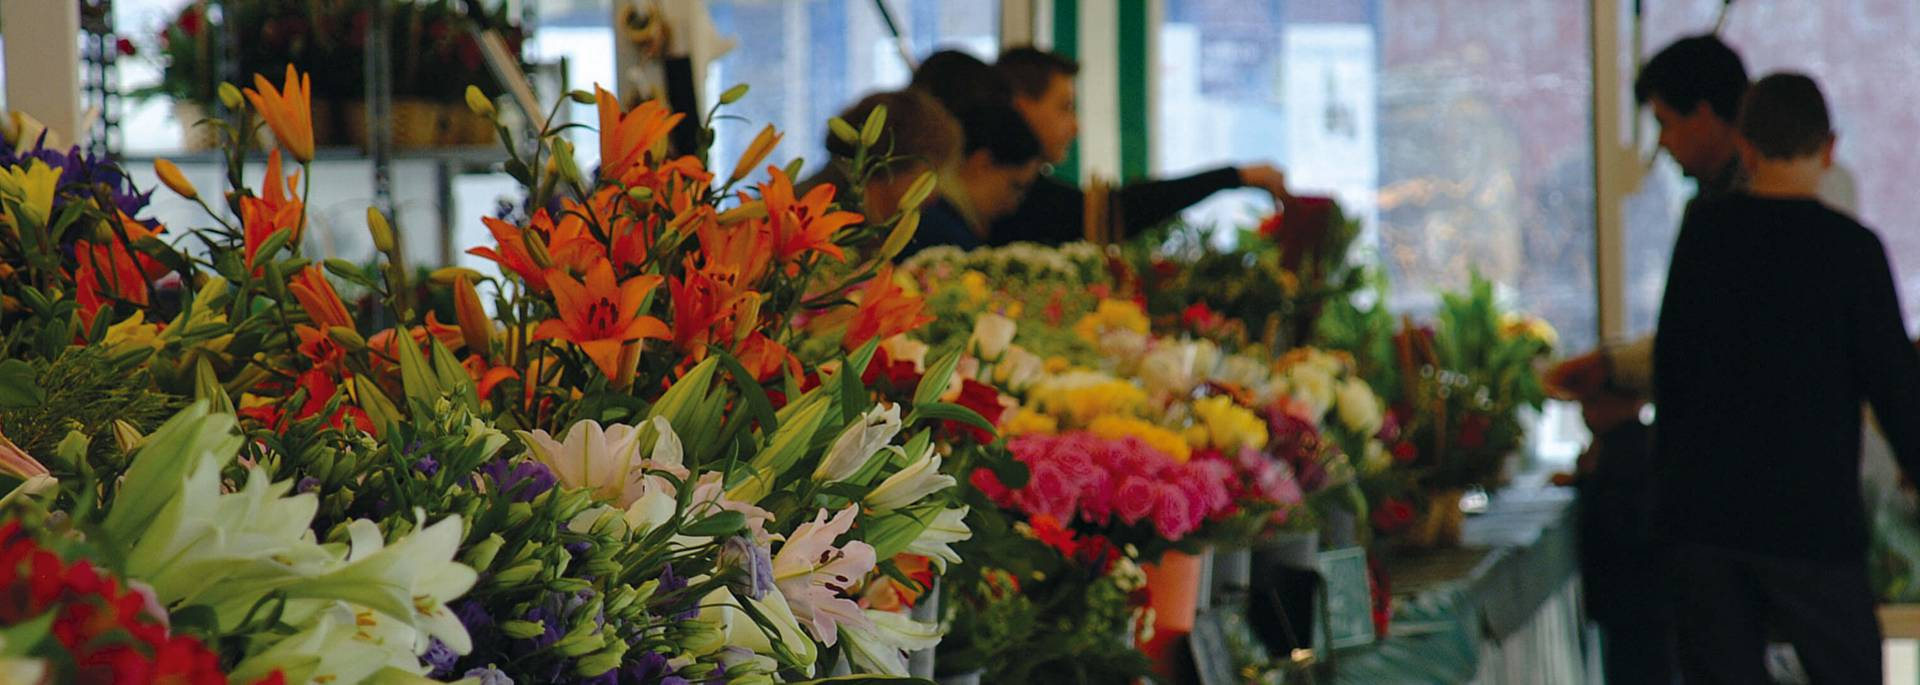 Flower market, Place du Cygne